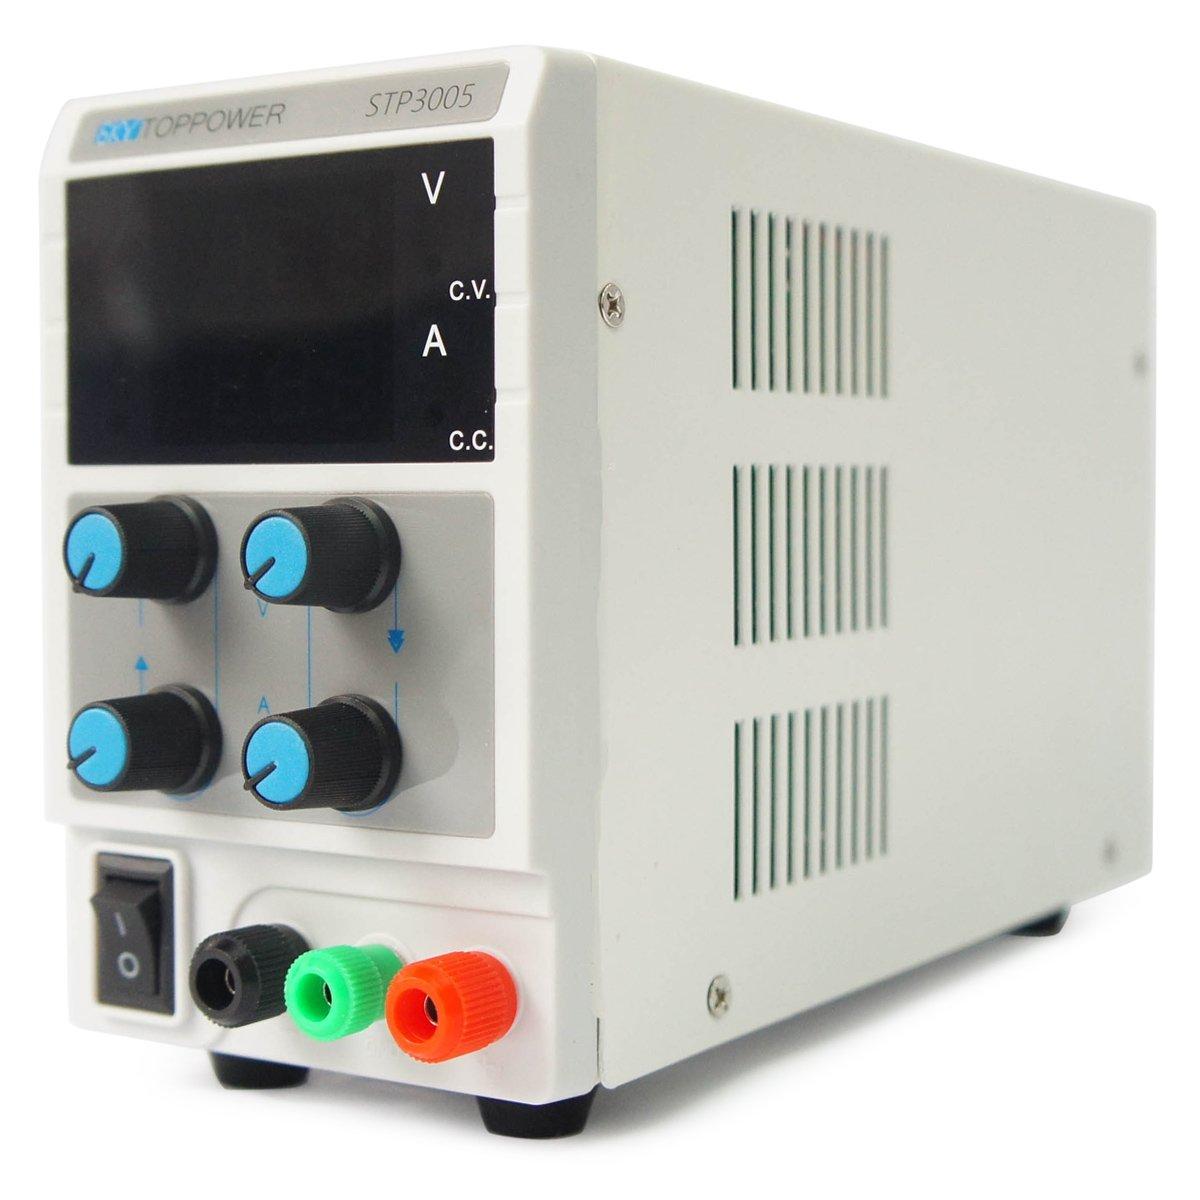 STP3005 30V/5A/150W DC Adjustable Power Supply - White